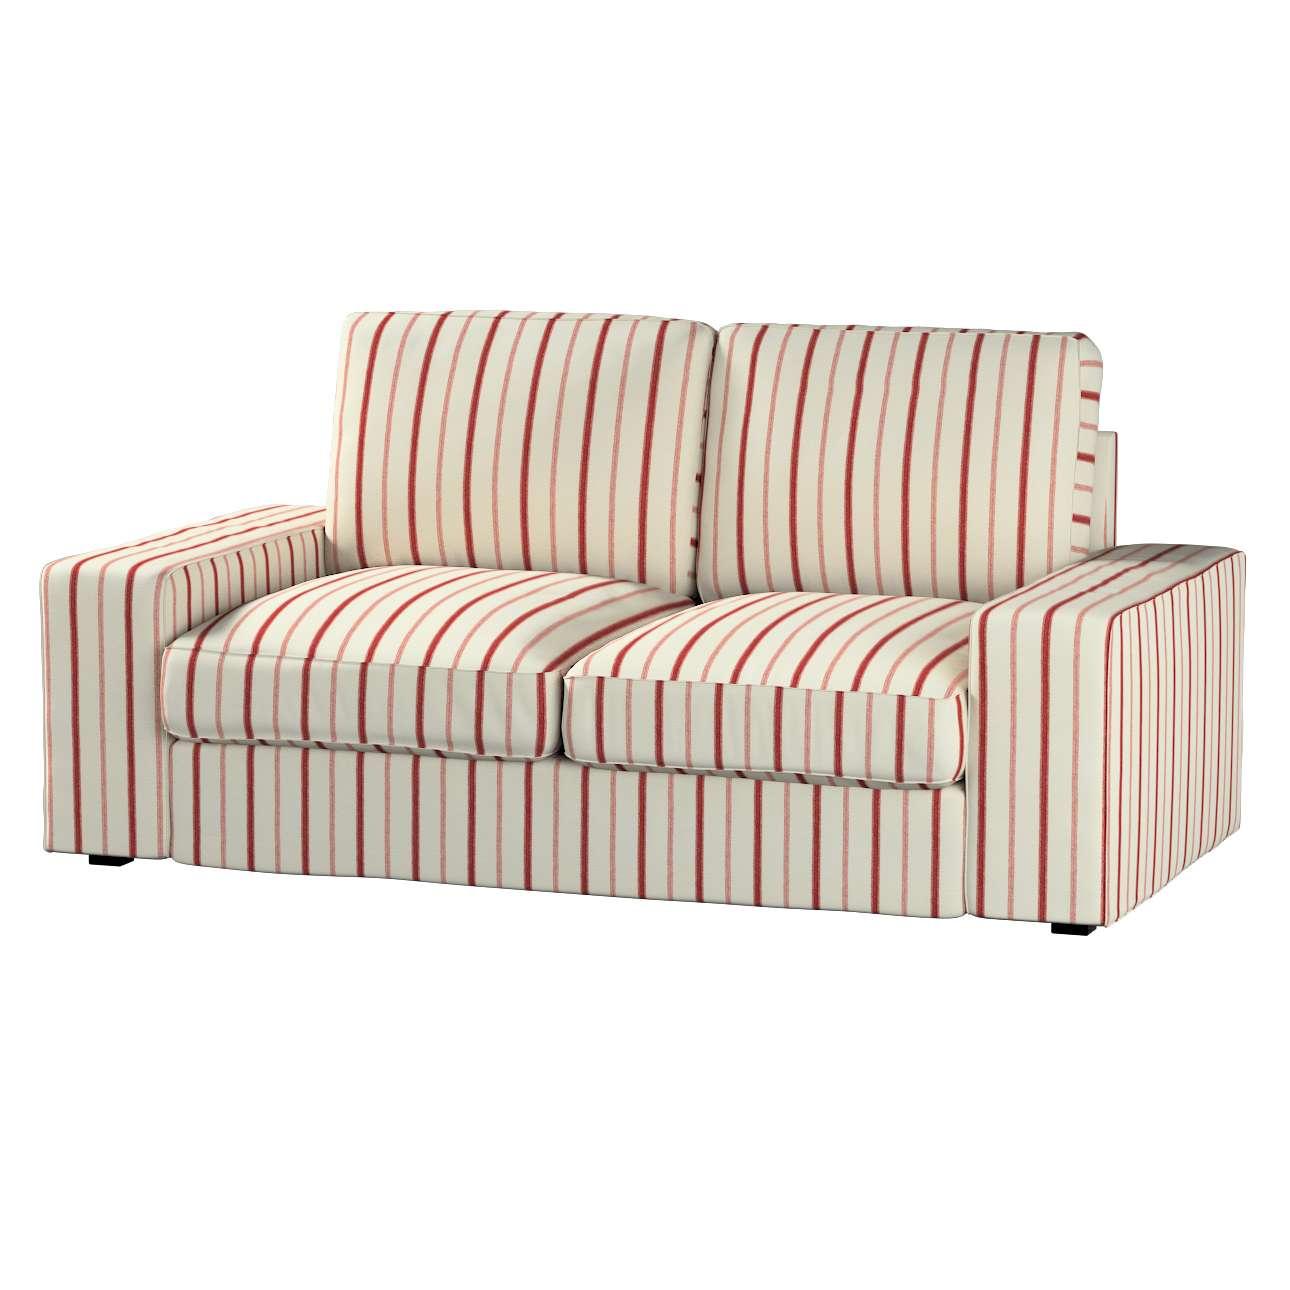 Kivik 2-Sitzer Sofabezug Sofa Kivik 2-Sitzer von der Kollektion Avinon, Stoff: 129-15